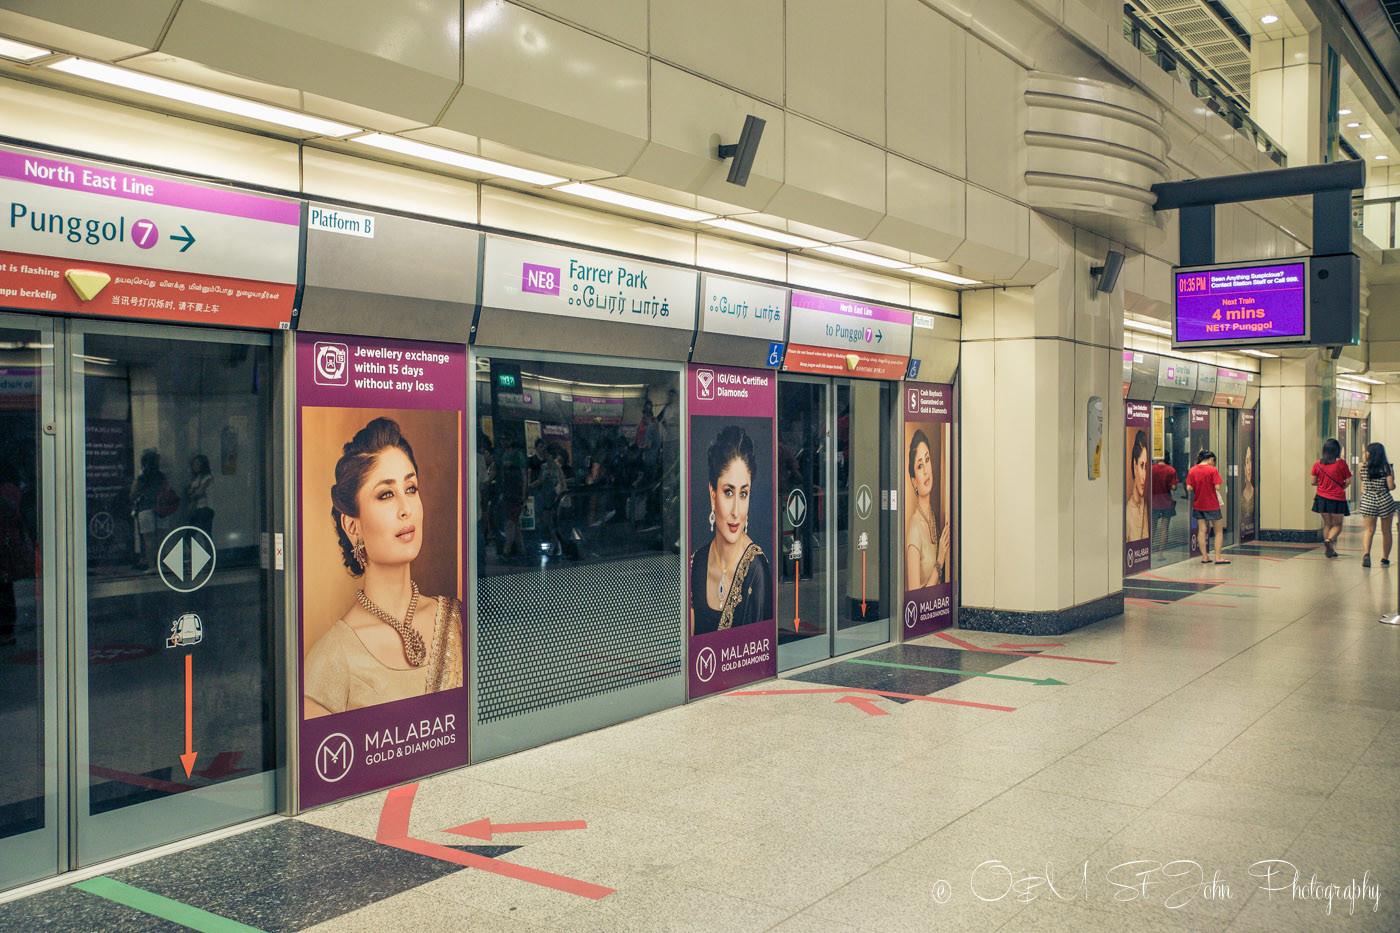 Take public transportation. Singapore on a budget